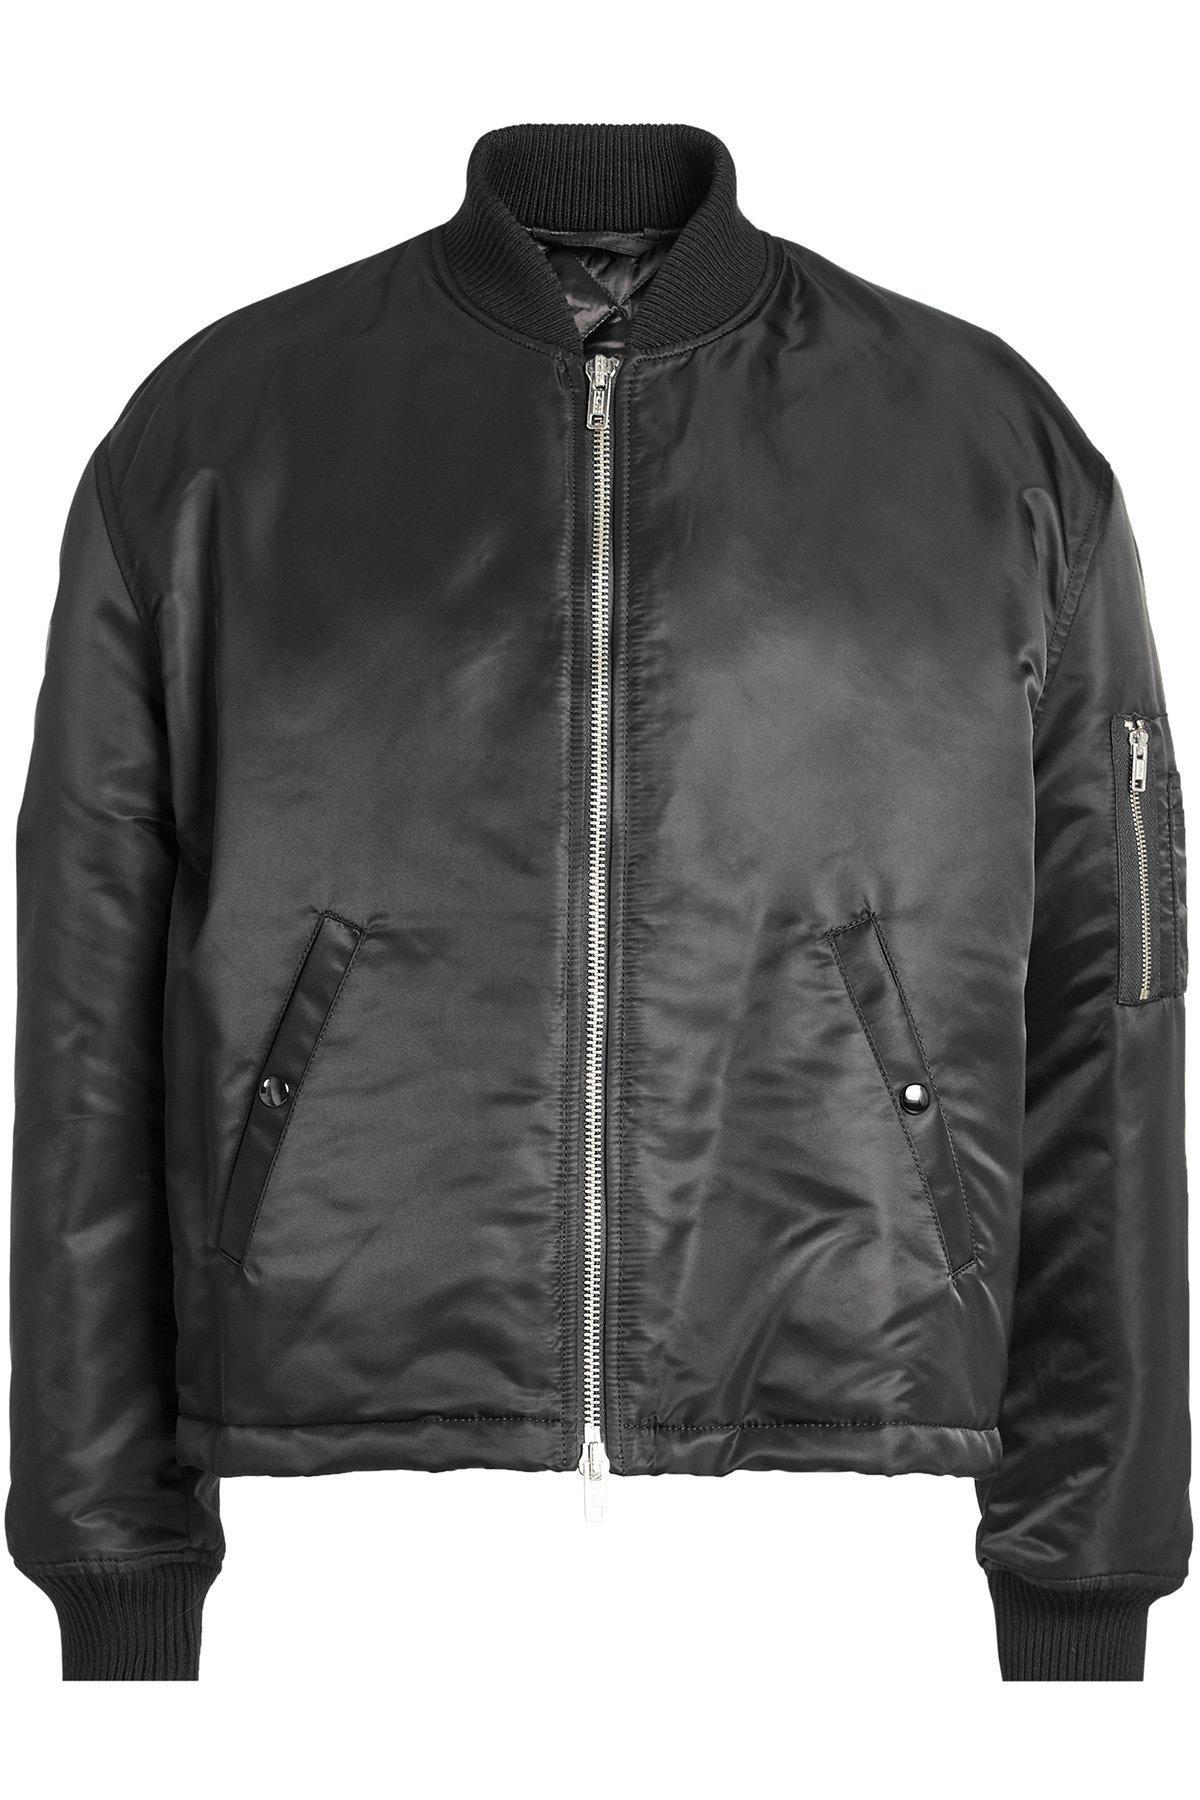 Raf Simons Satin Bomber Jacket In Black